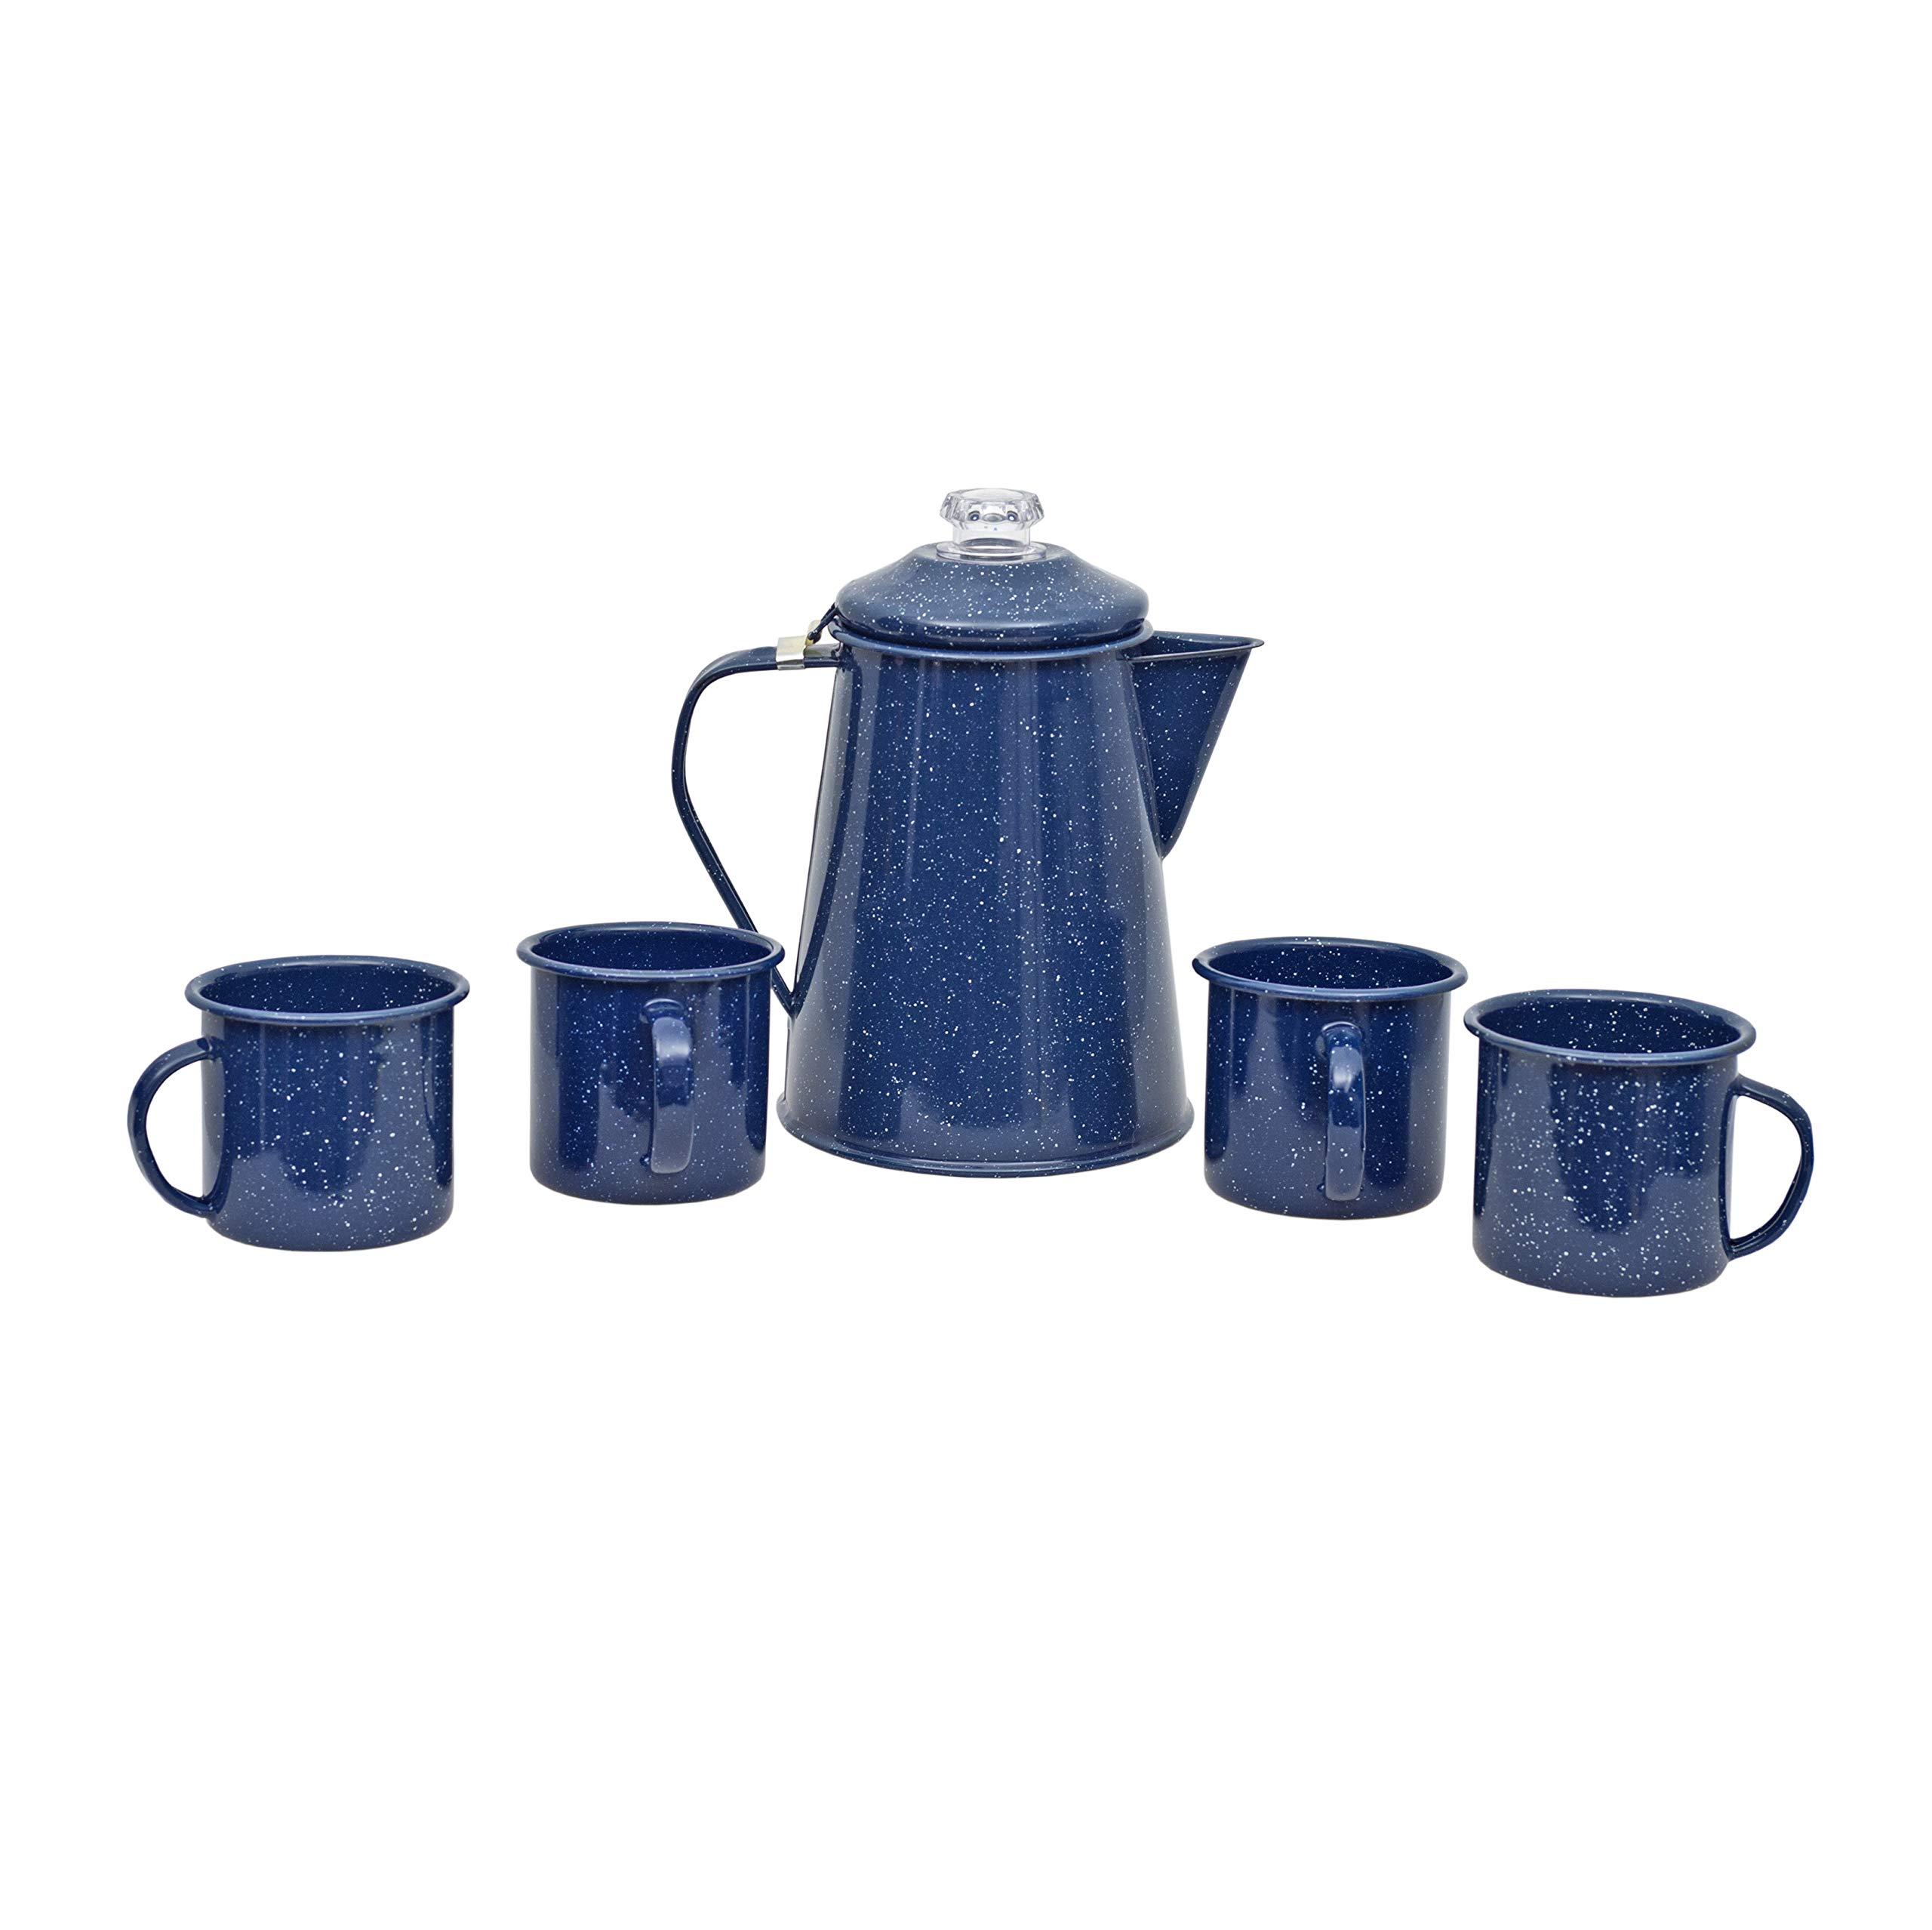 Granite Ware F0319DS-1 Casual Living 2QT Percolator, 4 12oz Mugs-Blue Coffee Percolator & Mug Set, 5 pc by Granite Ware